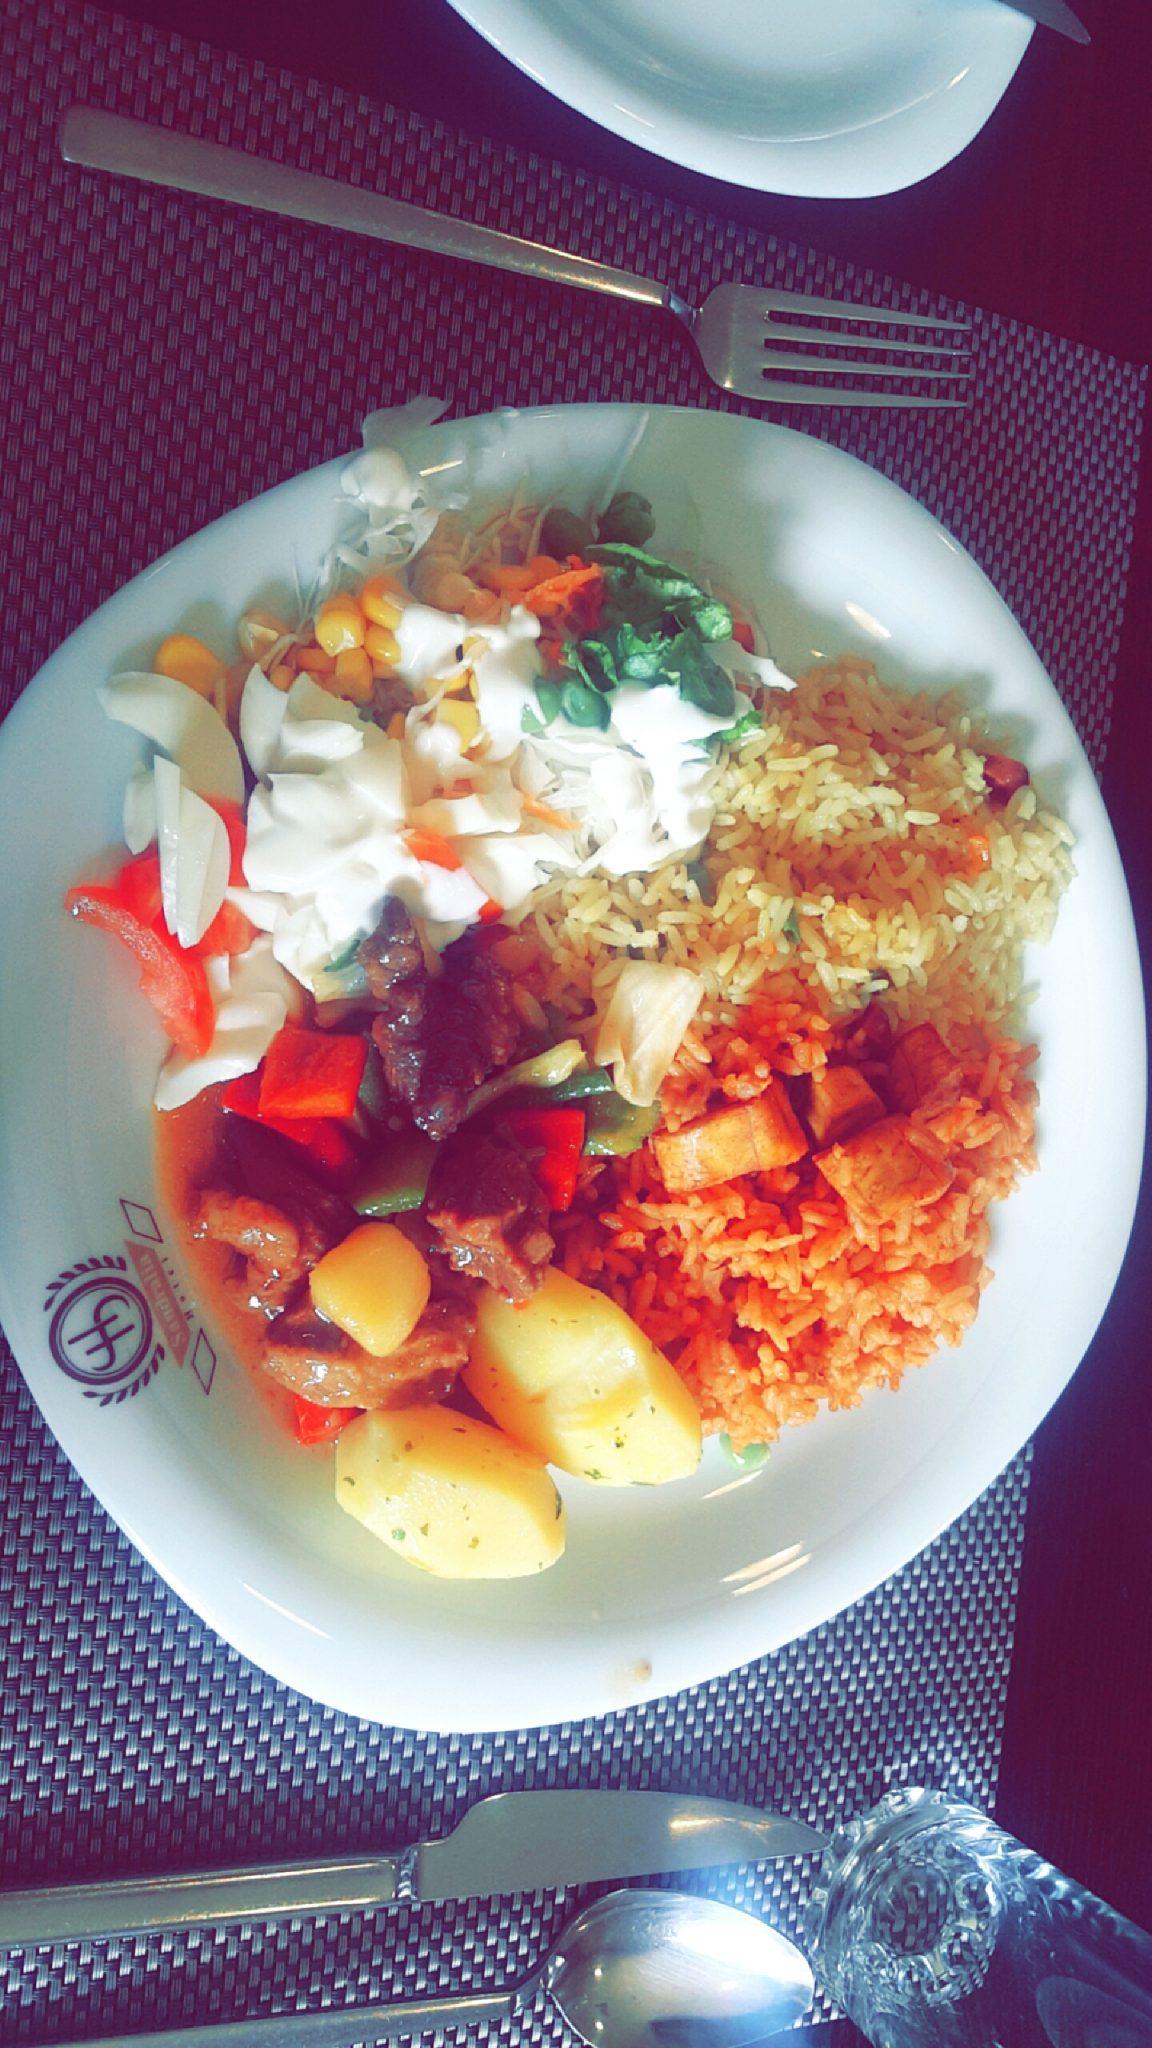 Lunch at Sandralia hotel